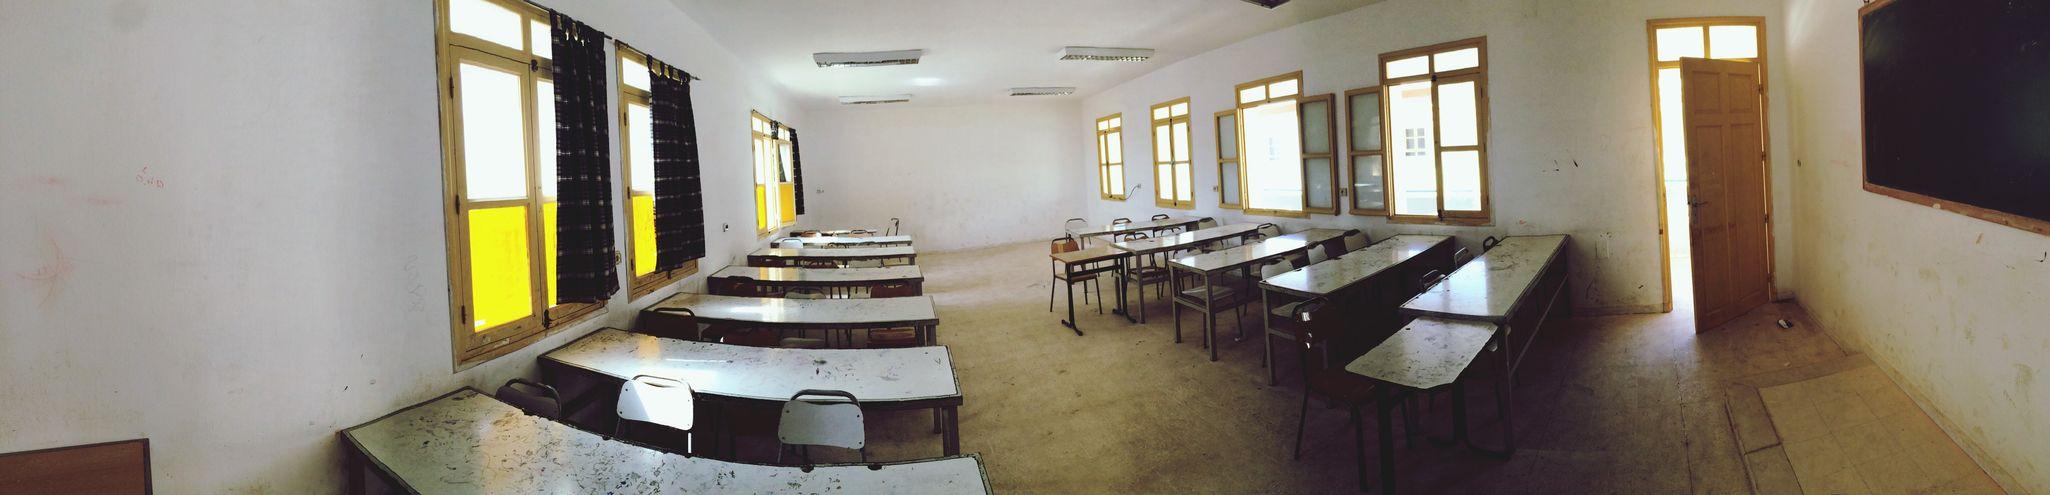 At School 💀🤓